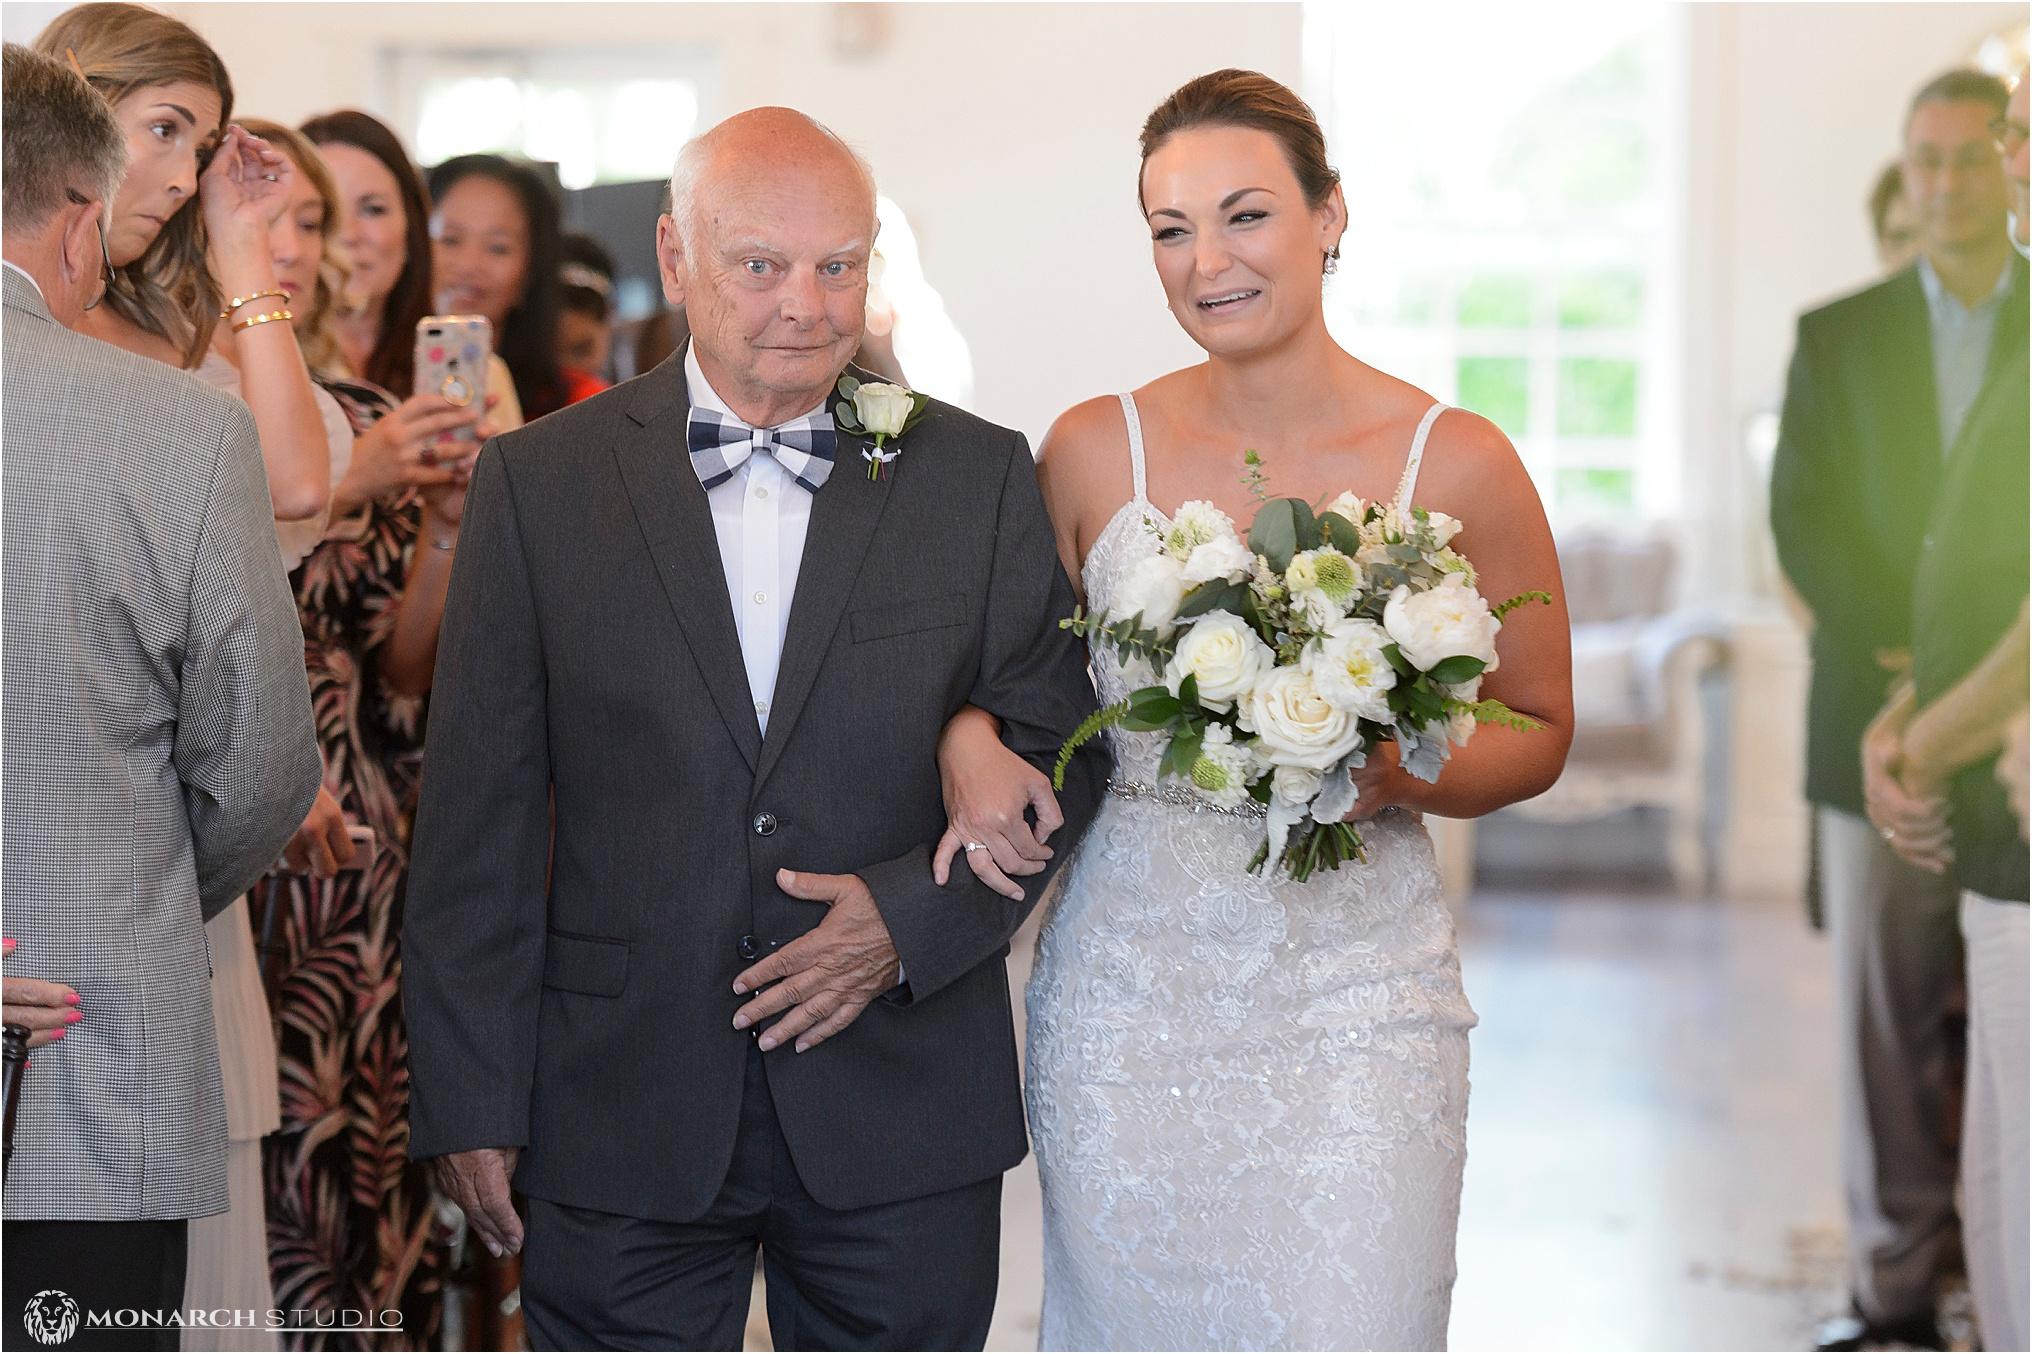 067-whiteroom-wedding-photographer-2019-05-22_0049.jpg